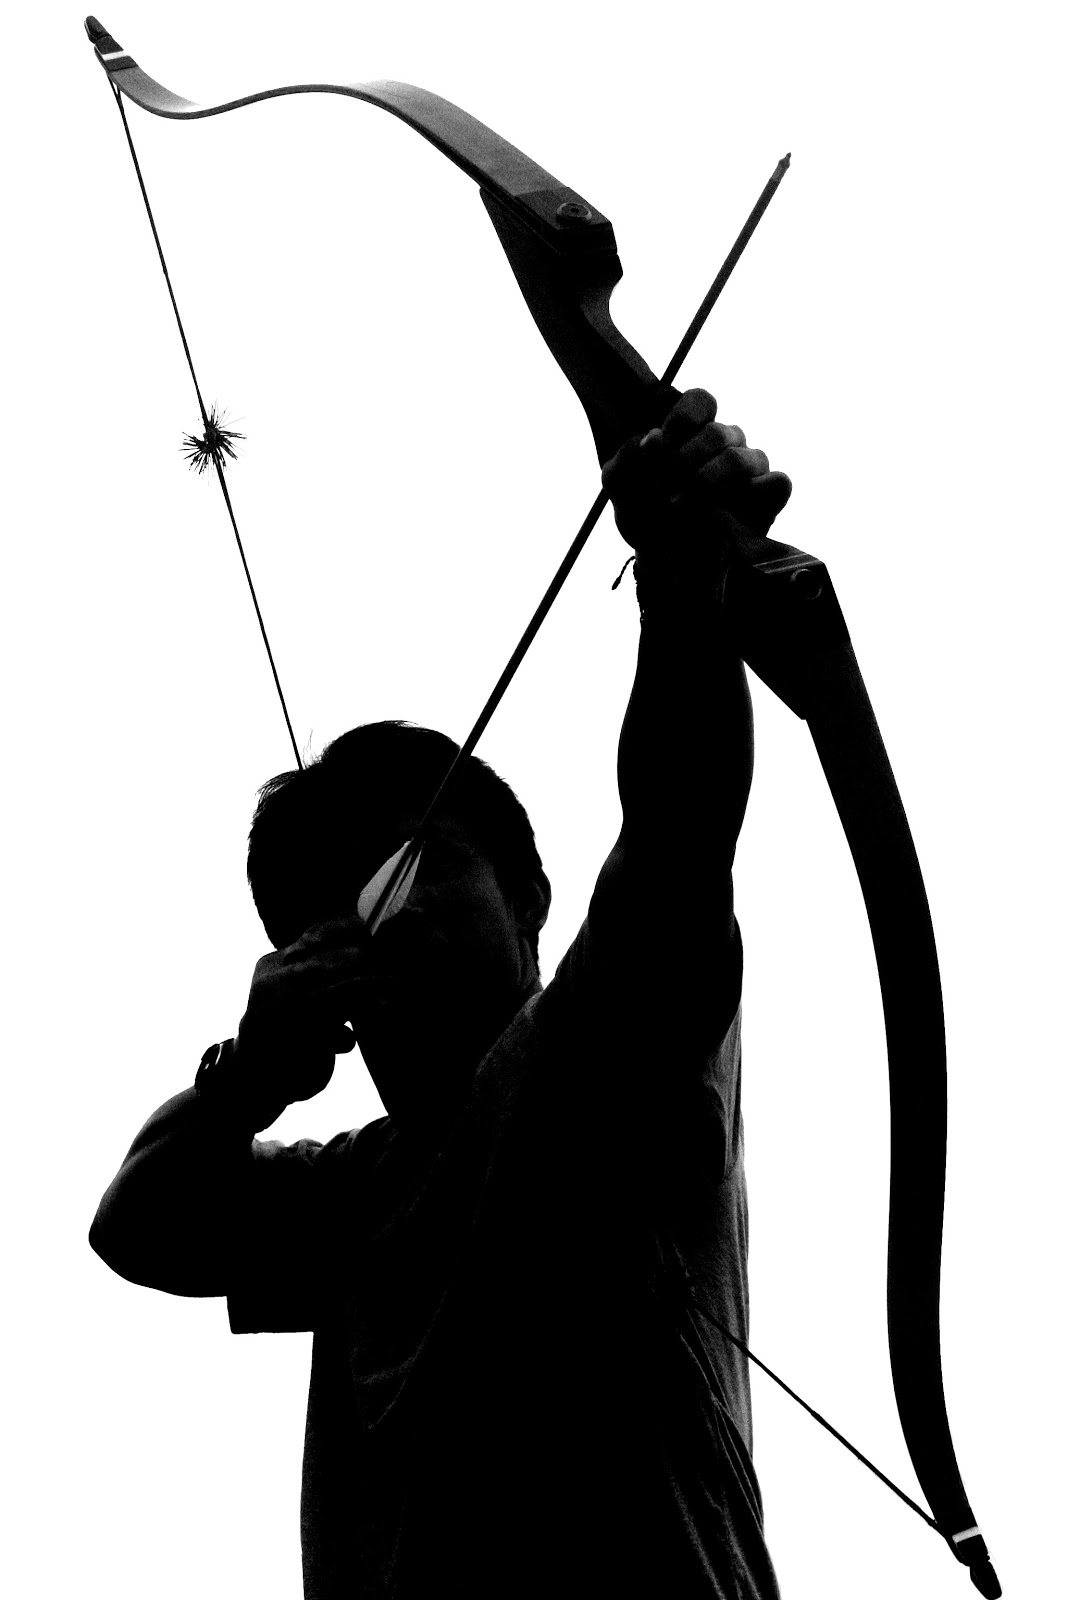 Bow and arrow clipartix. Archery clipart man